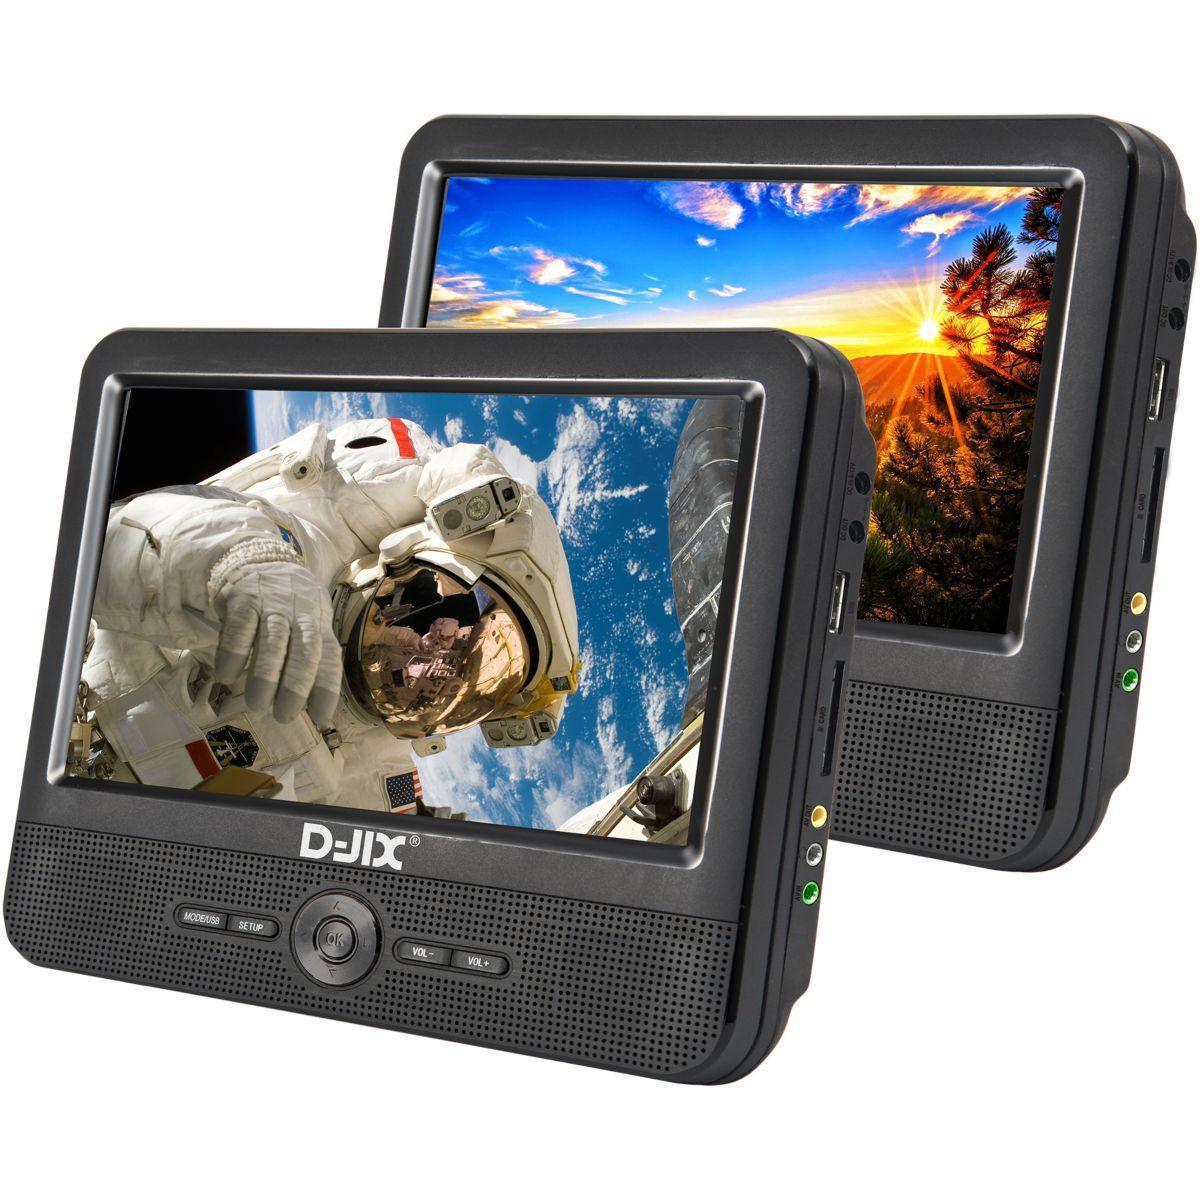 Lecteur dvd portable double ?cran d-jix pvs 906-70dp twin doub...